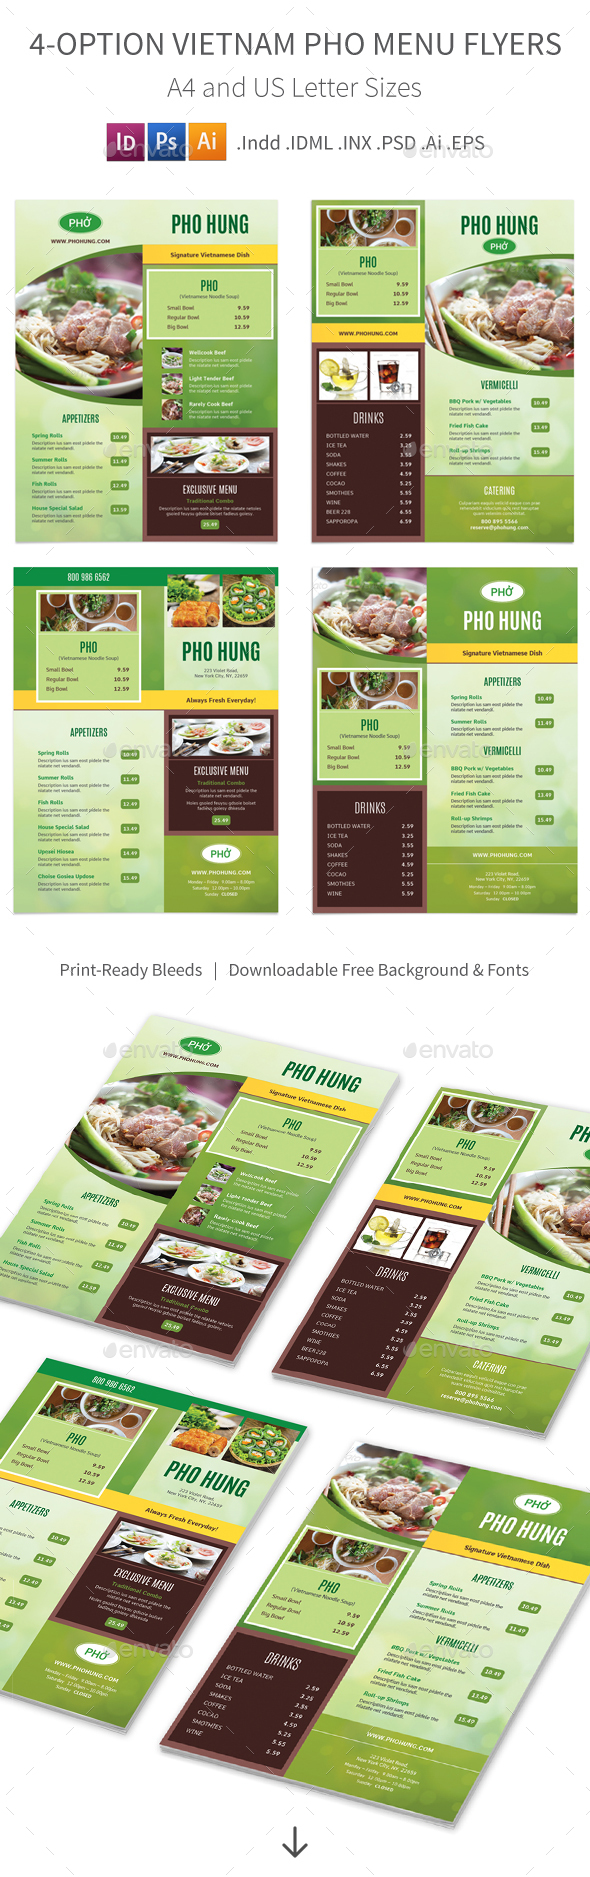 Vietnamese Pho Restaurant Menu Flyers – 4 Options